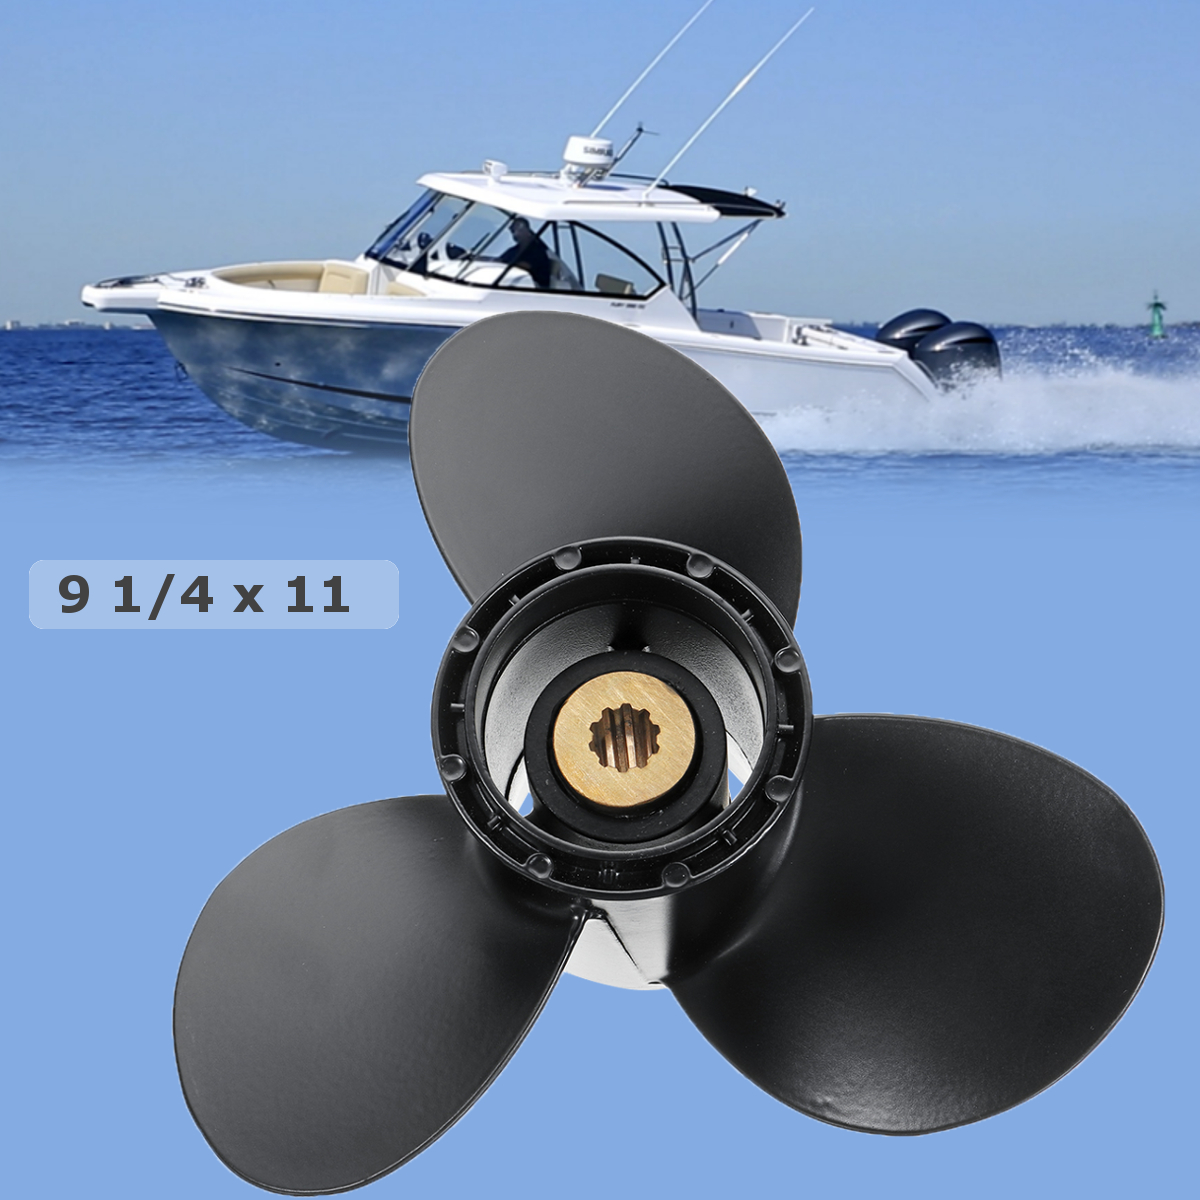 58100-93743-019 9 1/4x11 лодка подвесная Пропеллер для Suzuki 9,9-15HP алюминиевый сплав Черный 3 лезвия 10 сплайн зуб алюминий